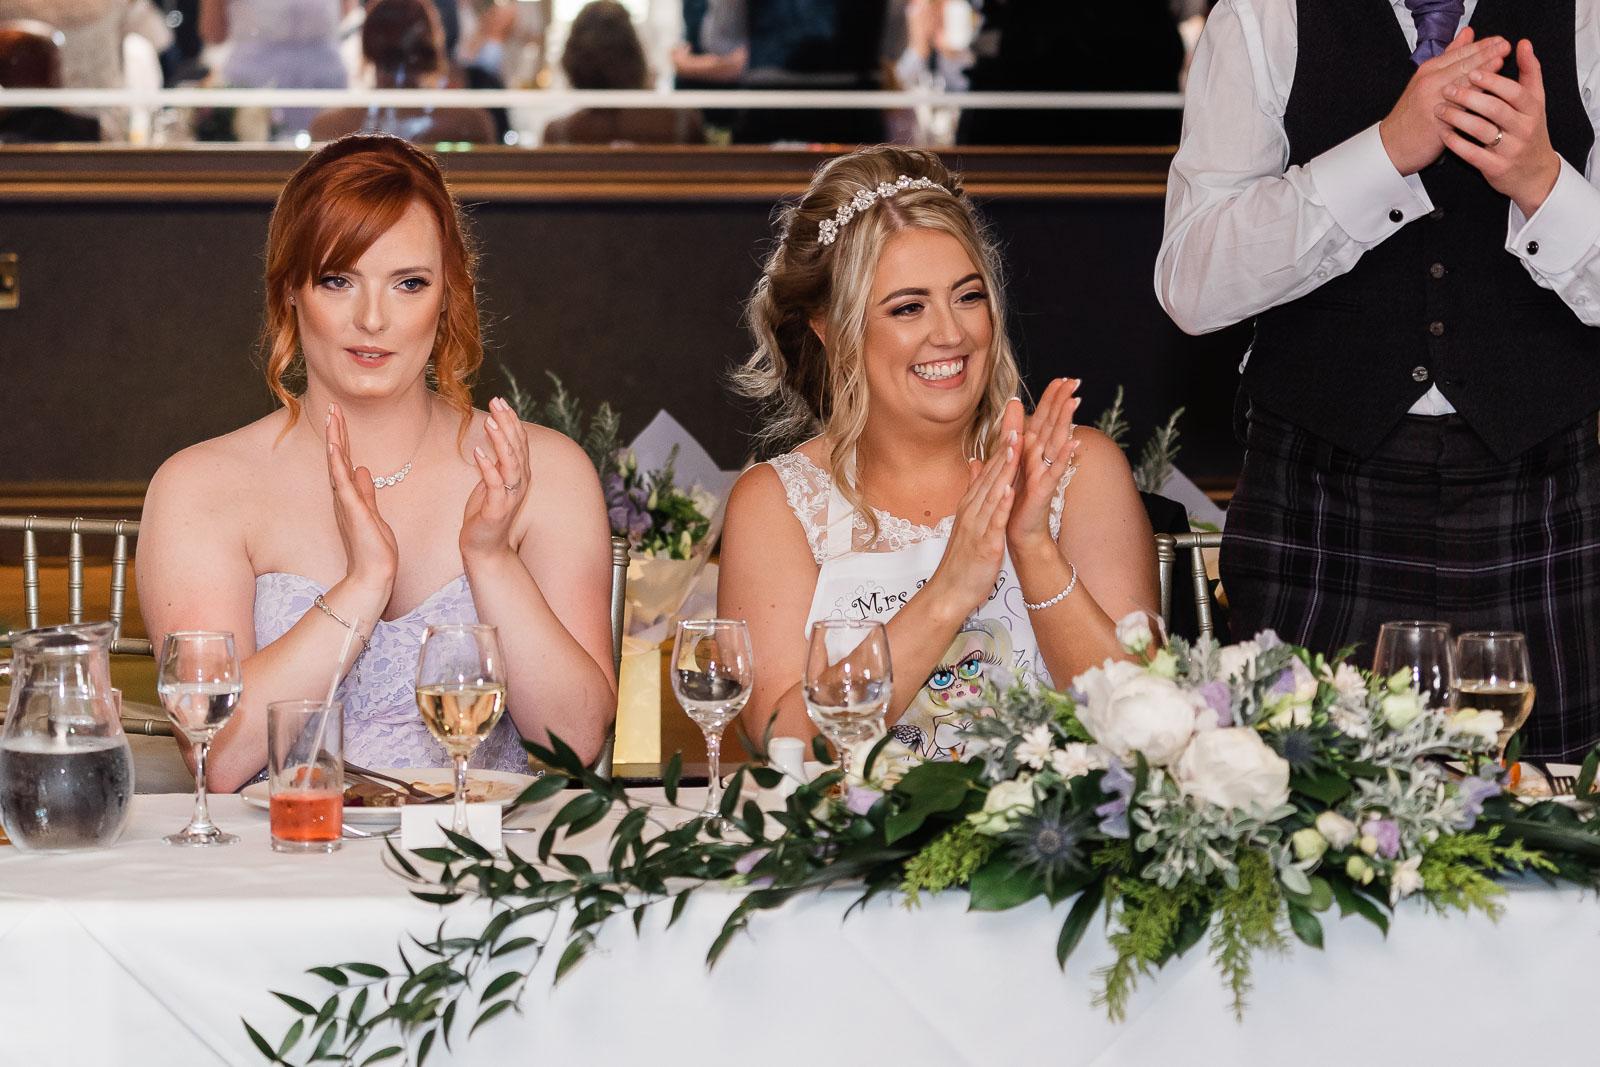 cornhill_castle_wedding_biggar_dearlyphotography (266 of 448).jpg